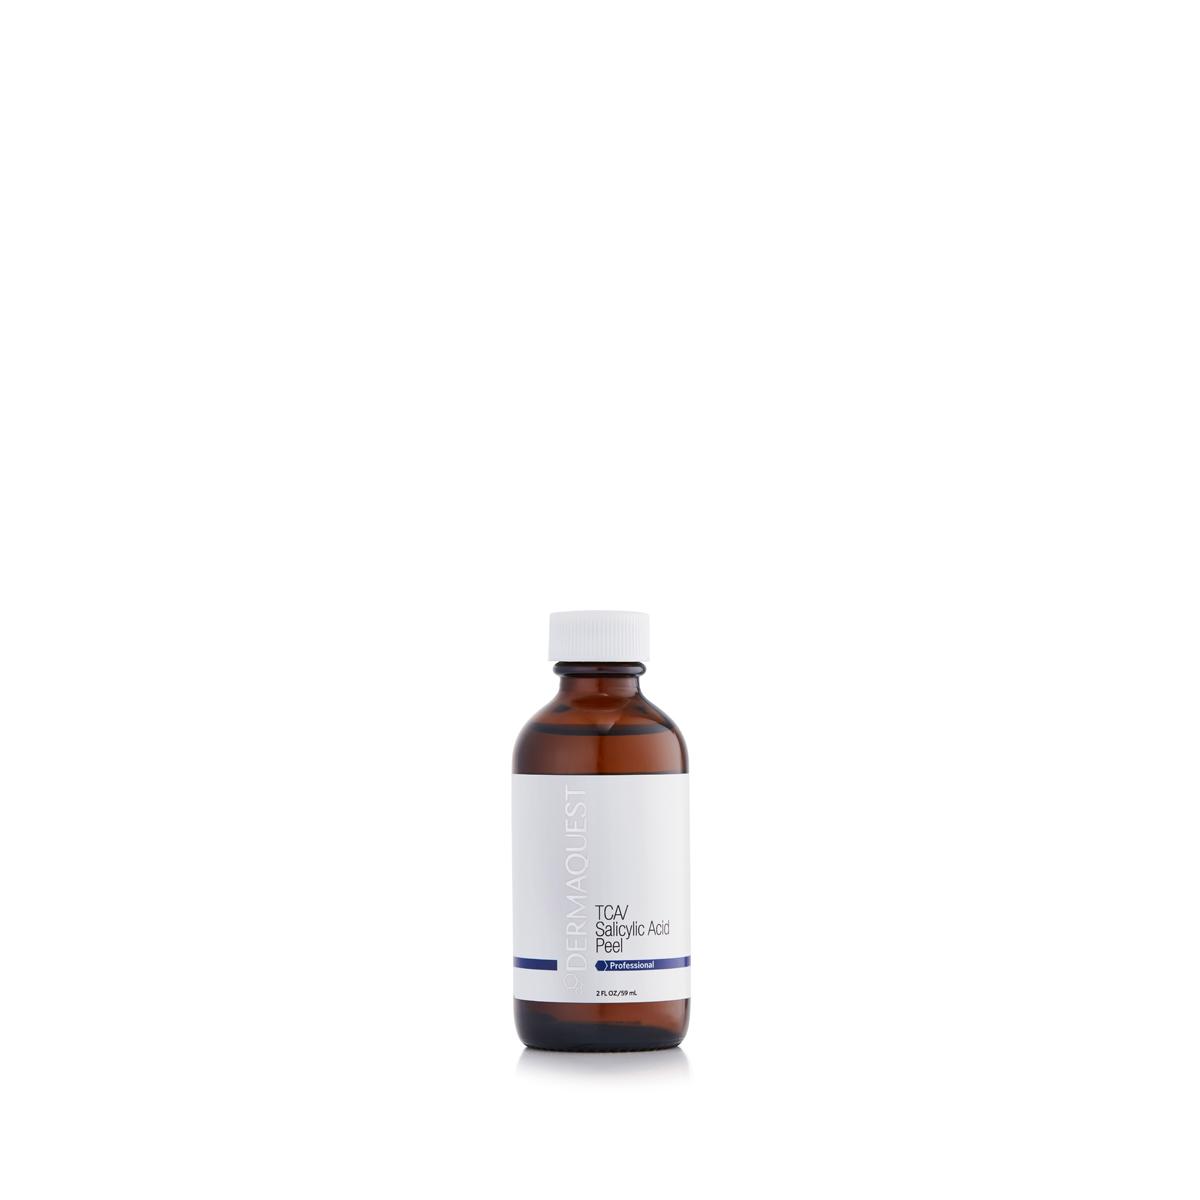 TCA Salicylic Acid Peel – Professional